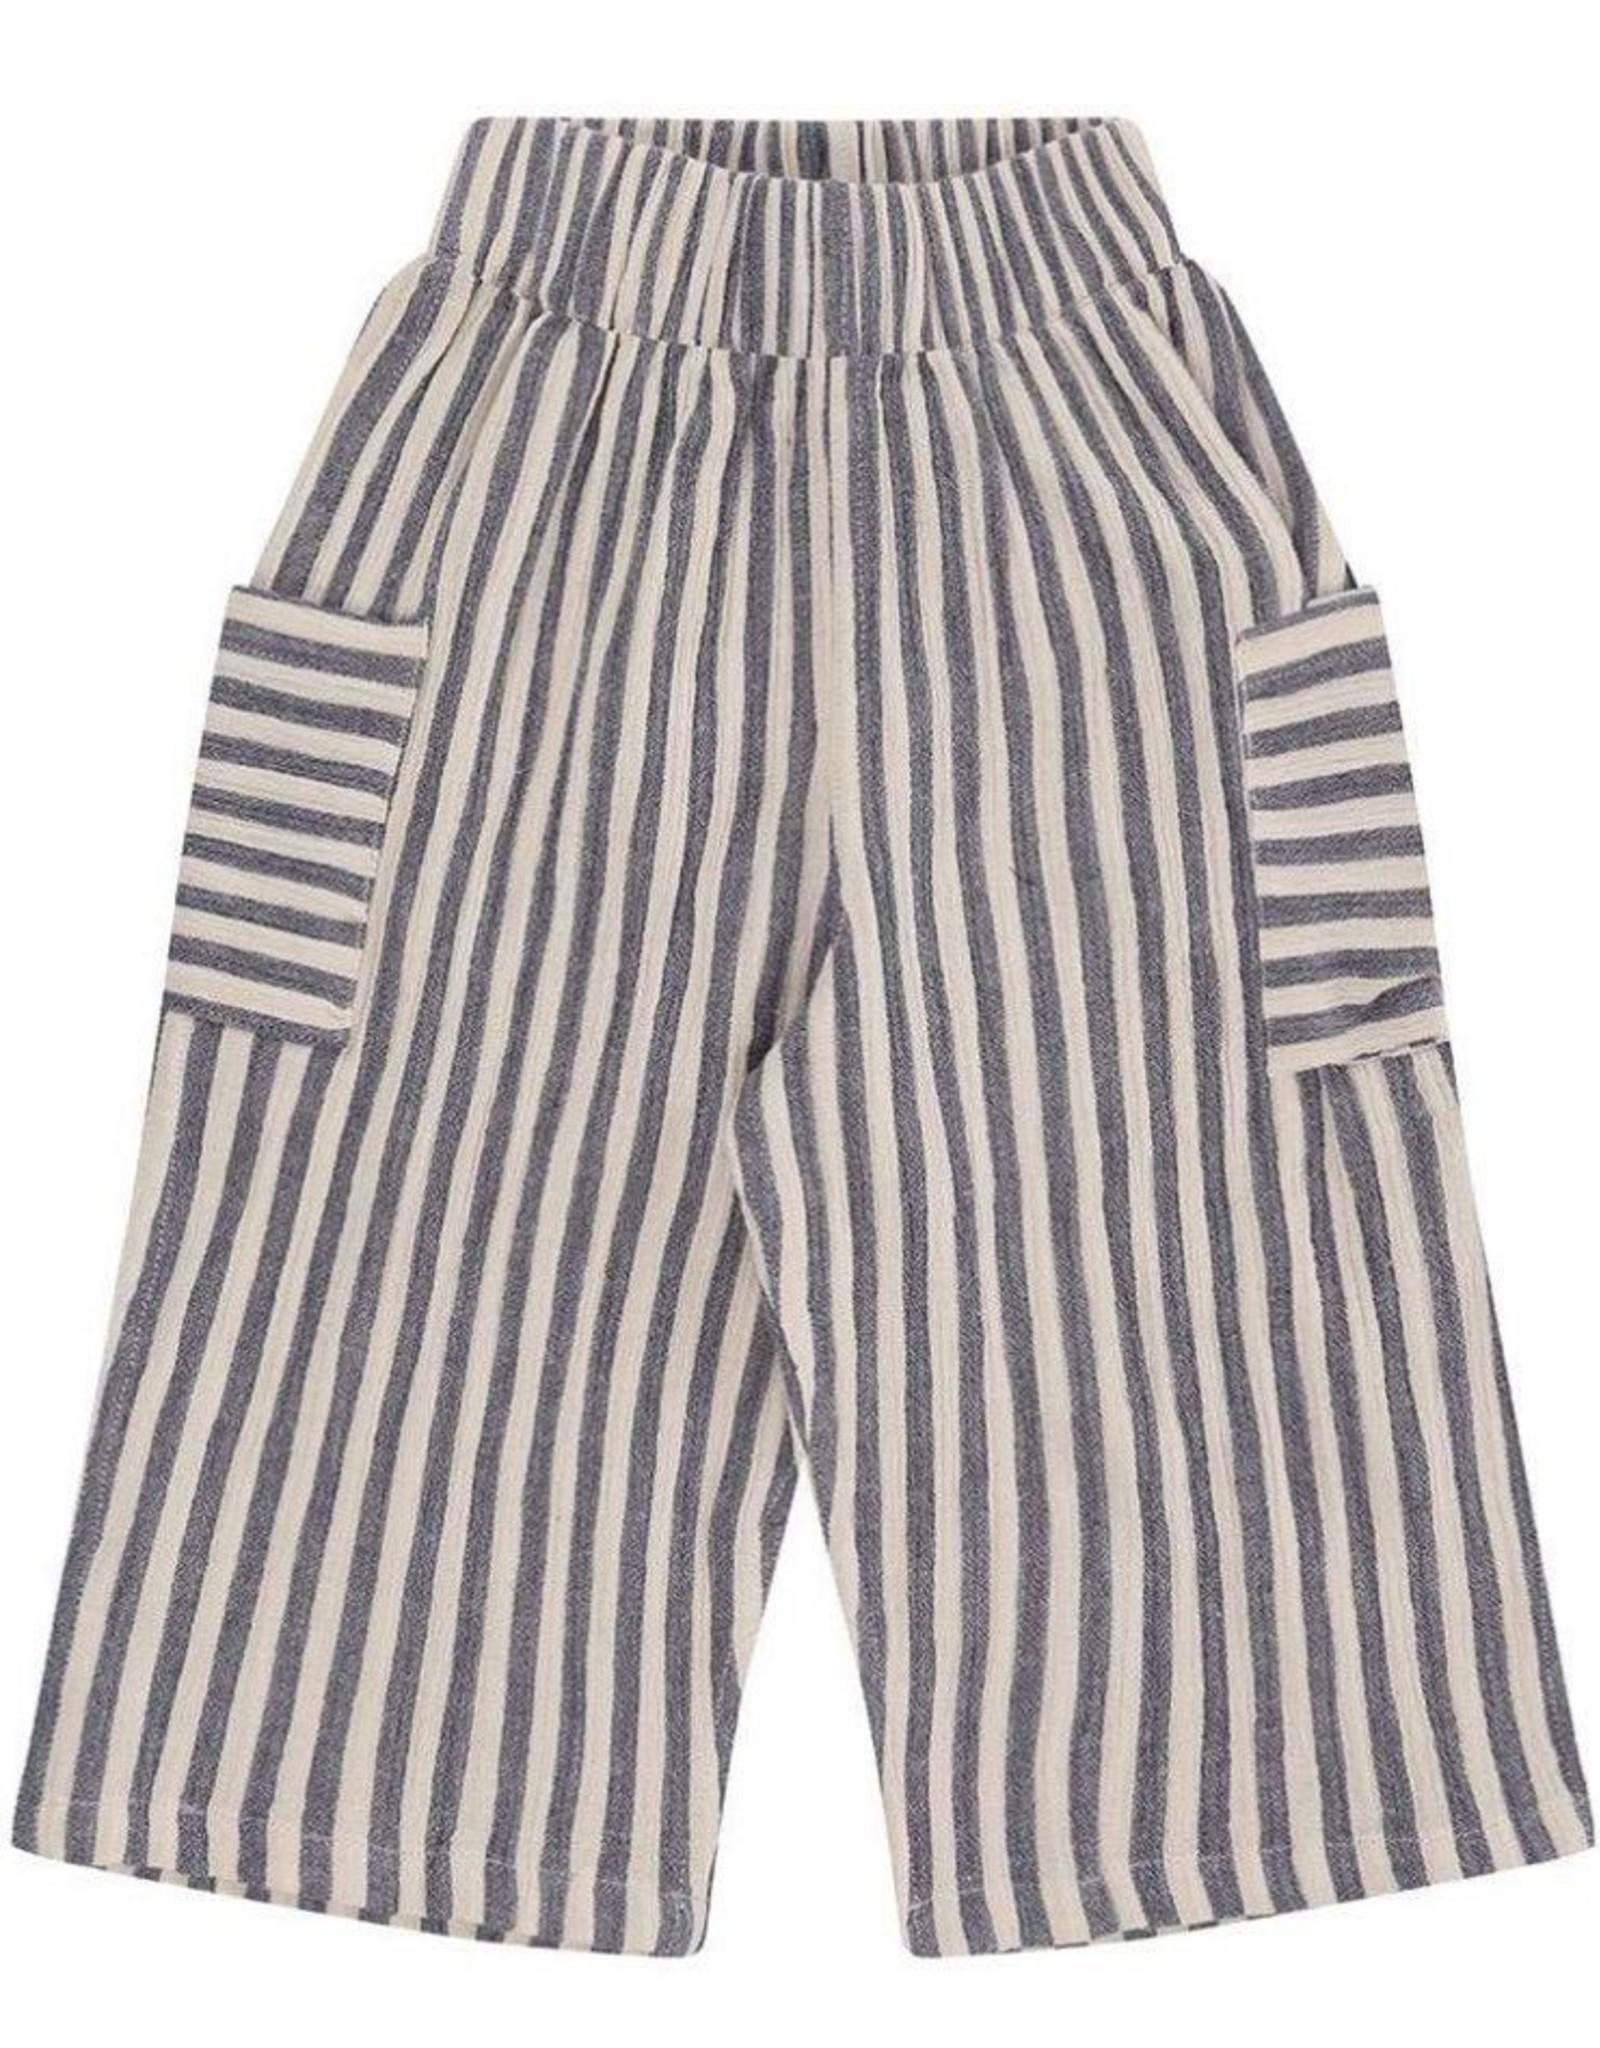 Turtledove London Reversible Summer Trouers - Crinkle Stripe